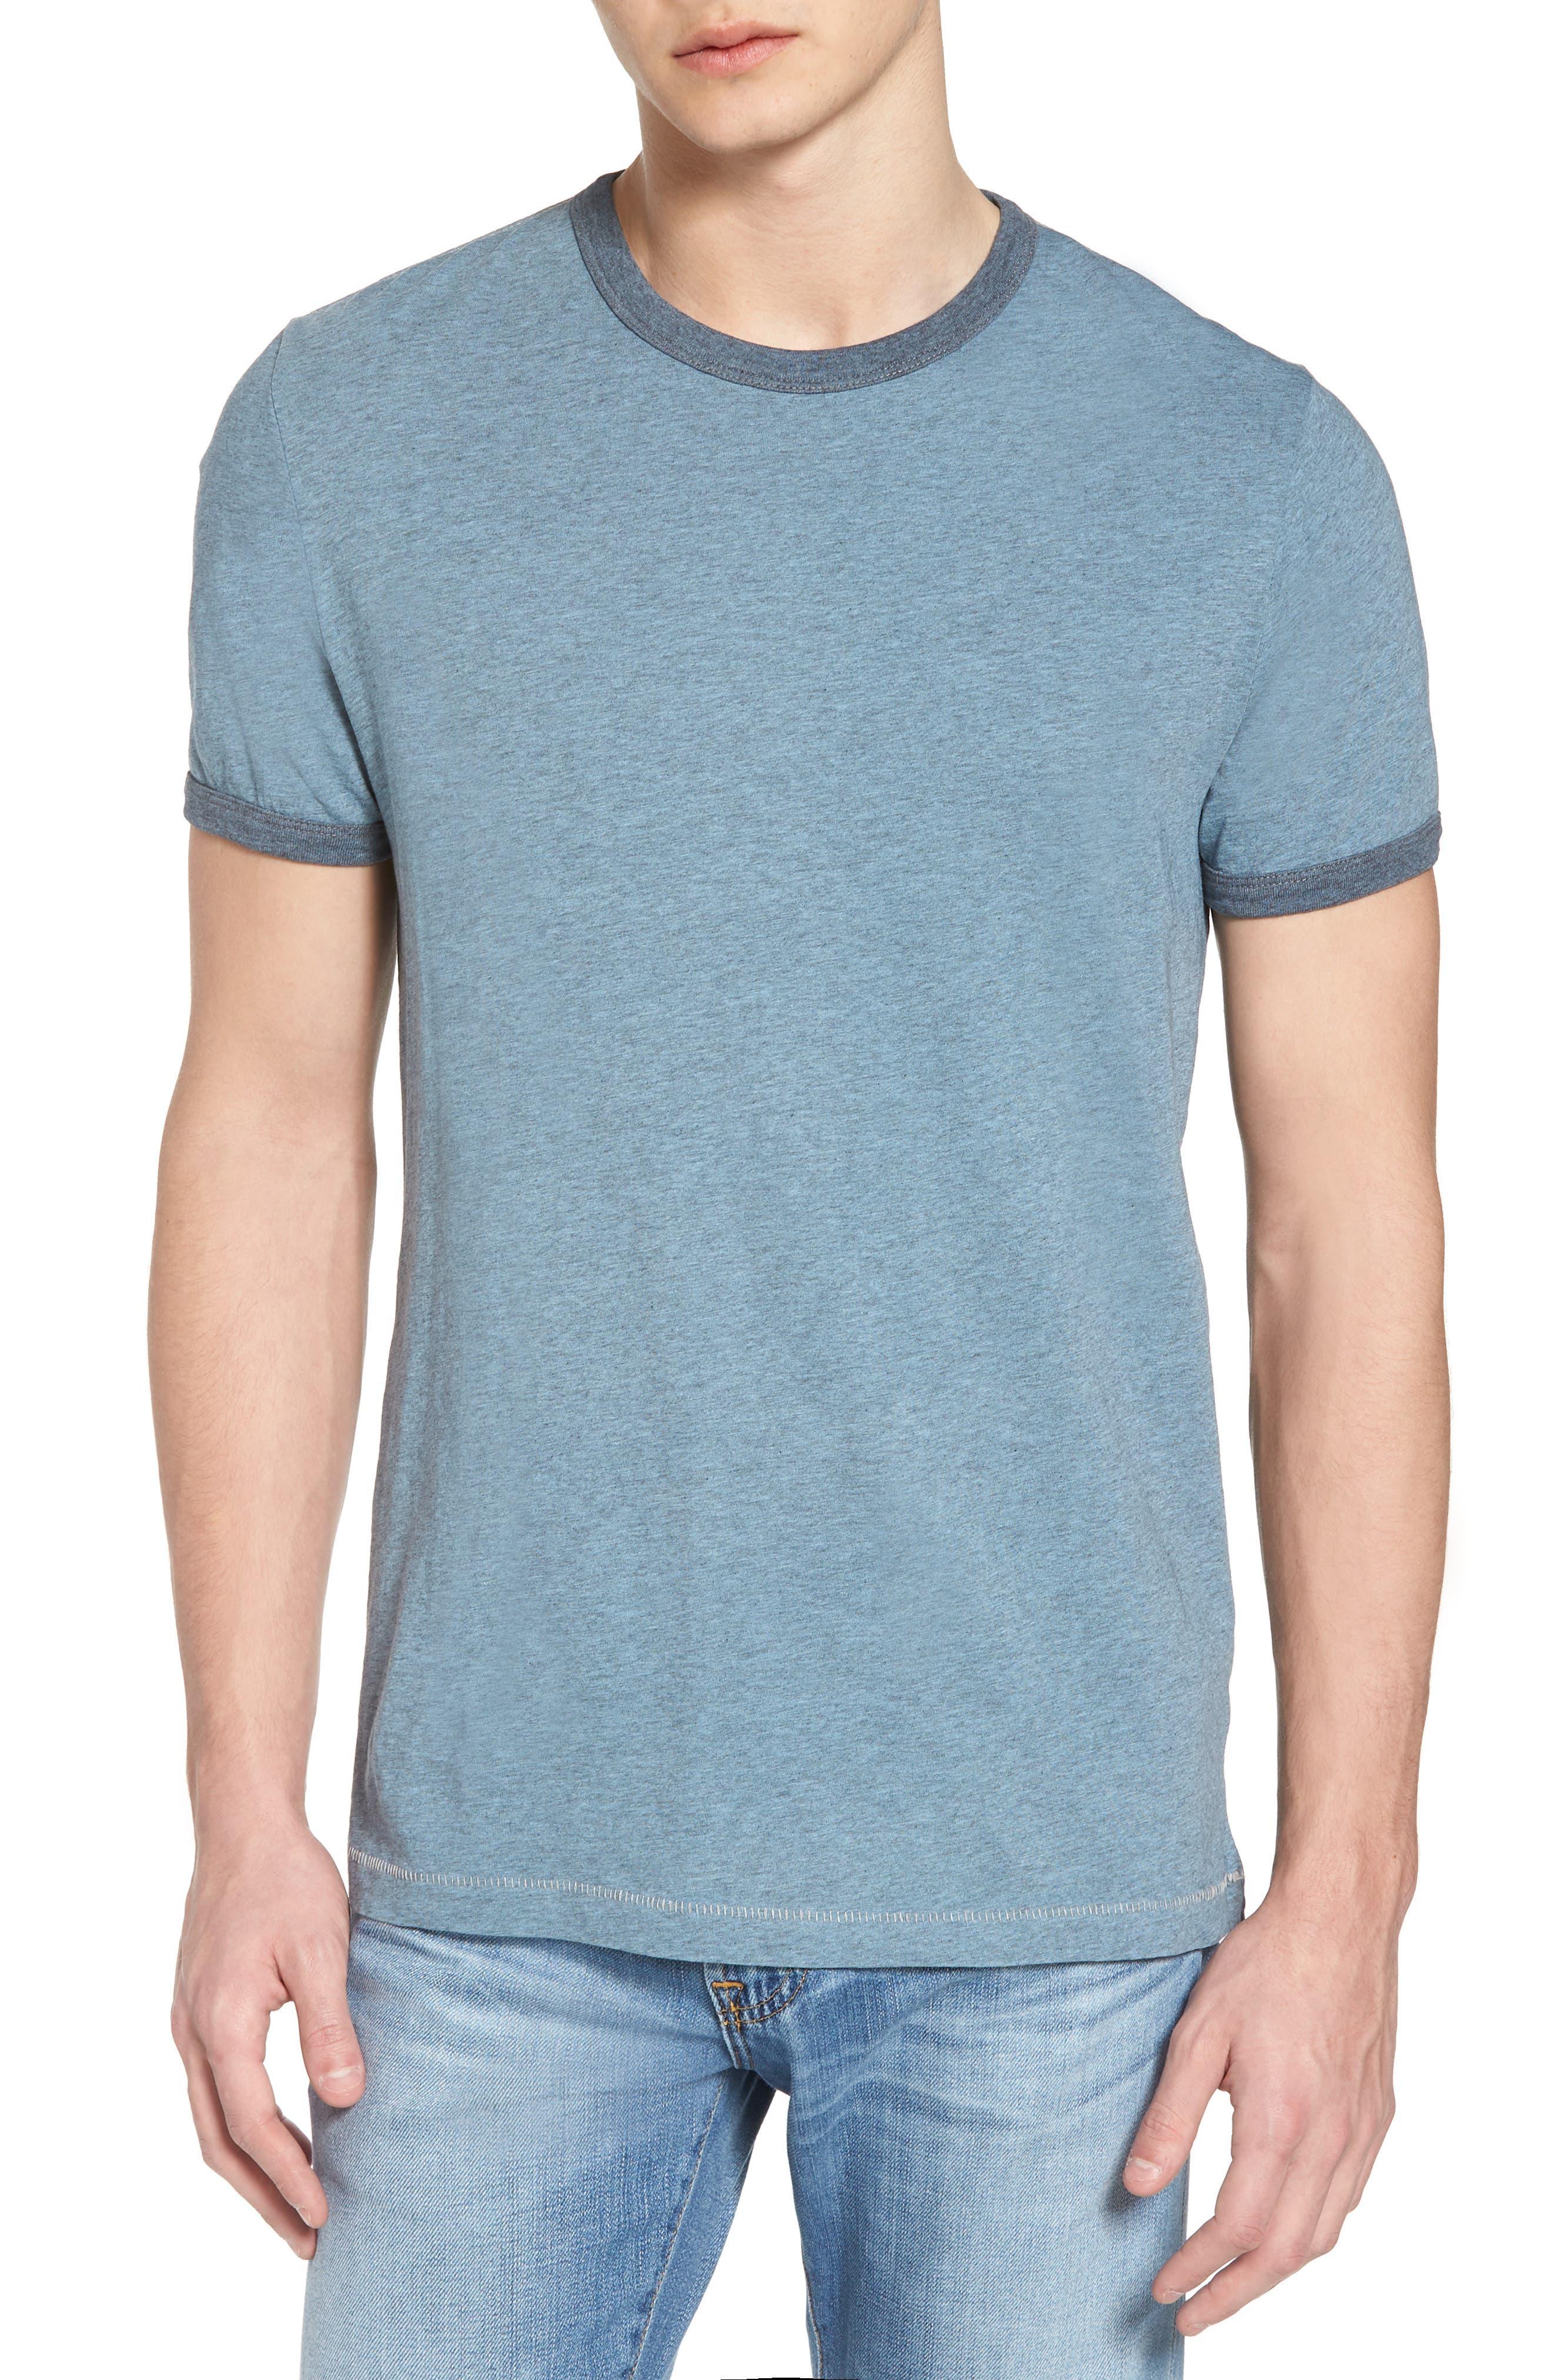 Bens Slim Fit Ringer T-Shirt,                         Main,                         color, Overdyed Ashley Blue